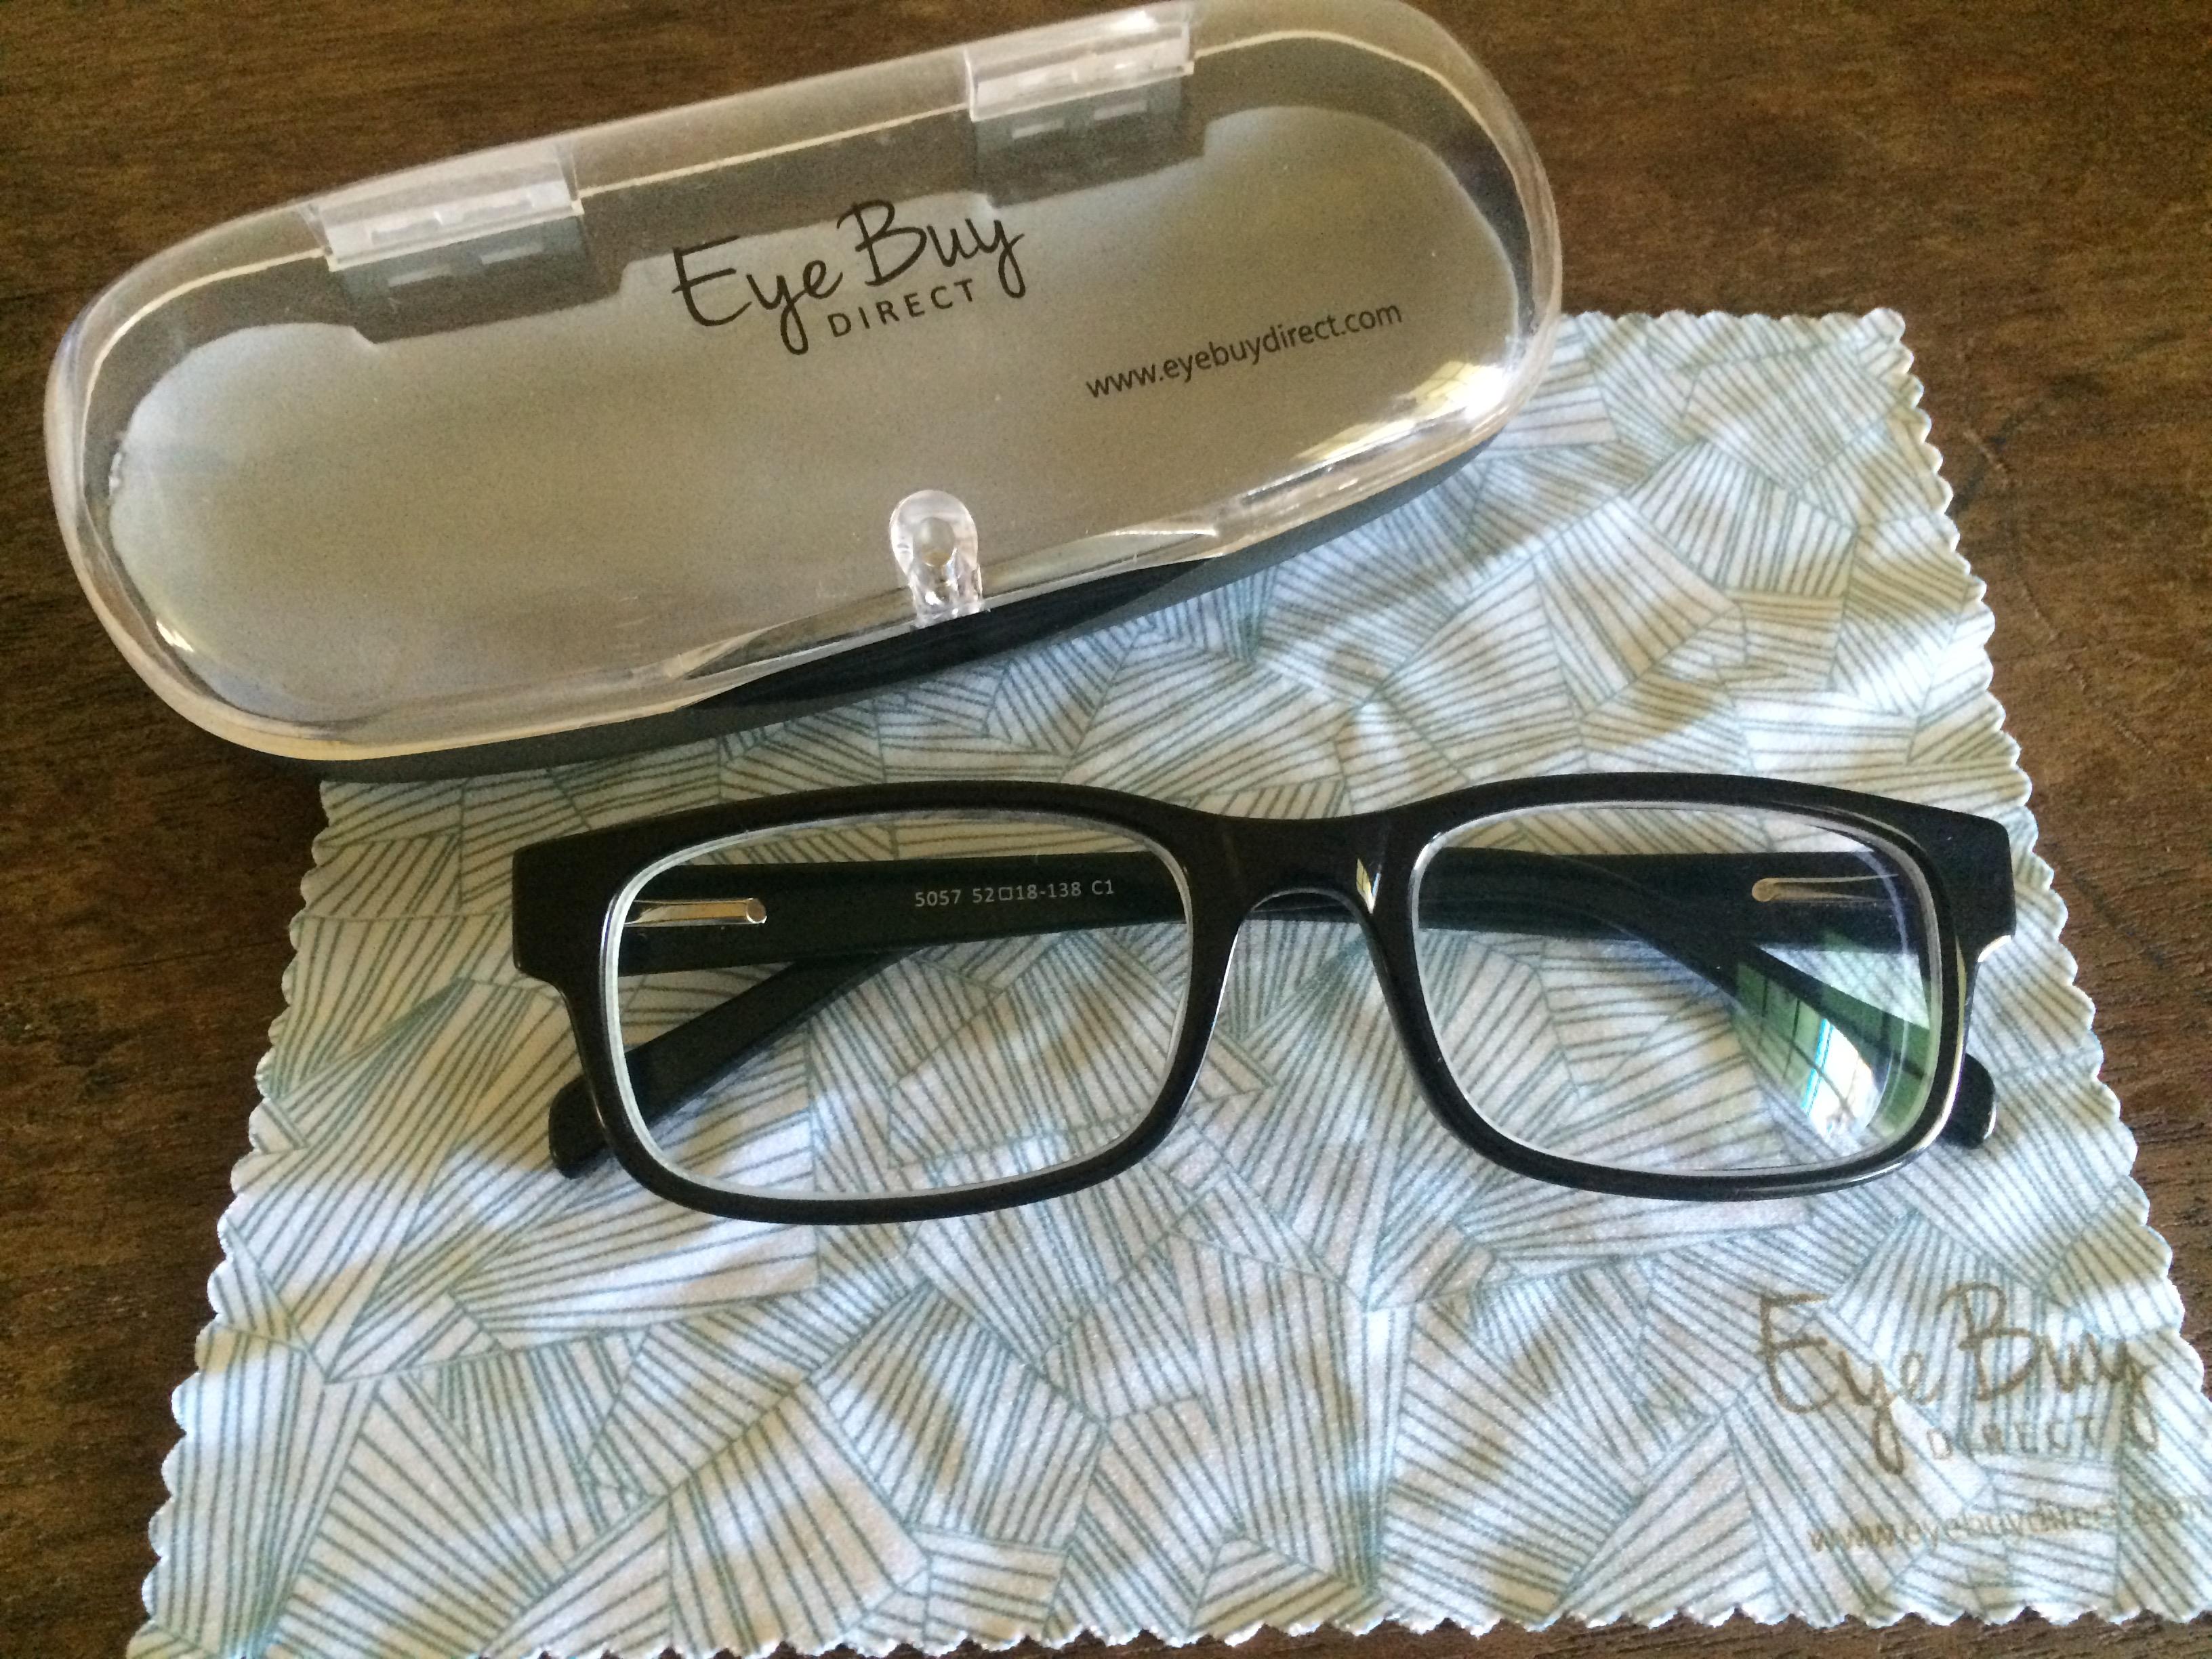 da64623c3d Eyebuydirect Glasses Reviews - Bitterroot Public Library